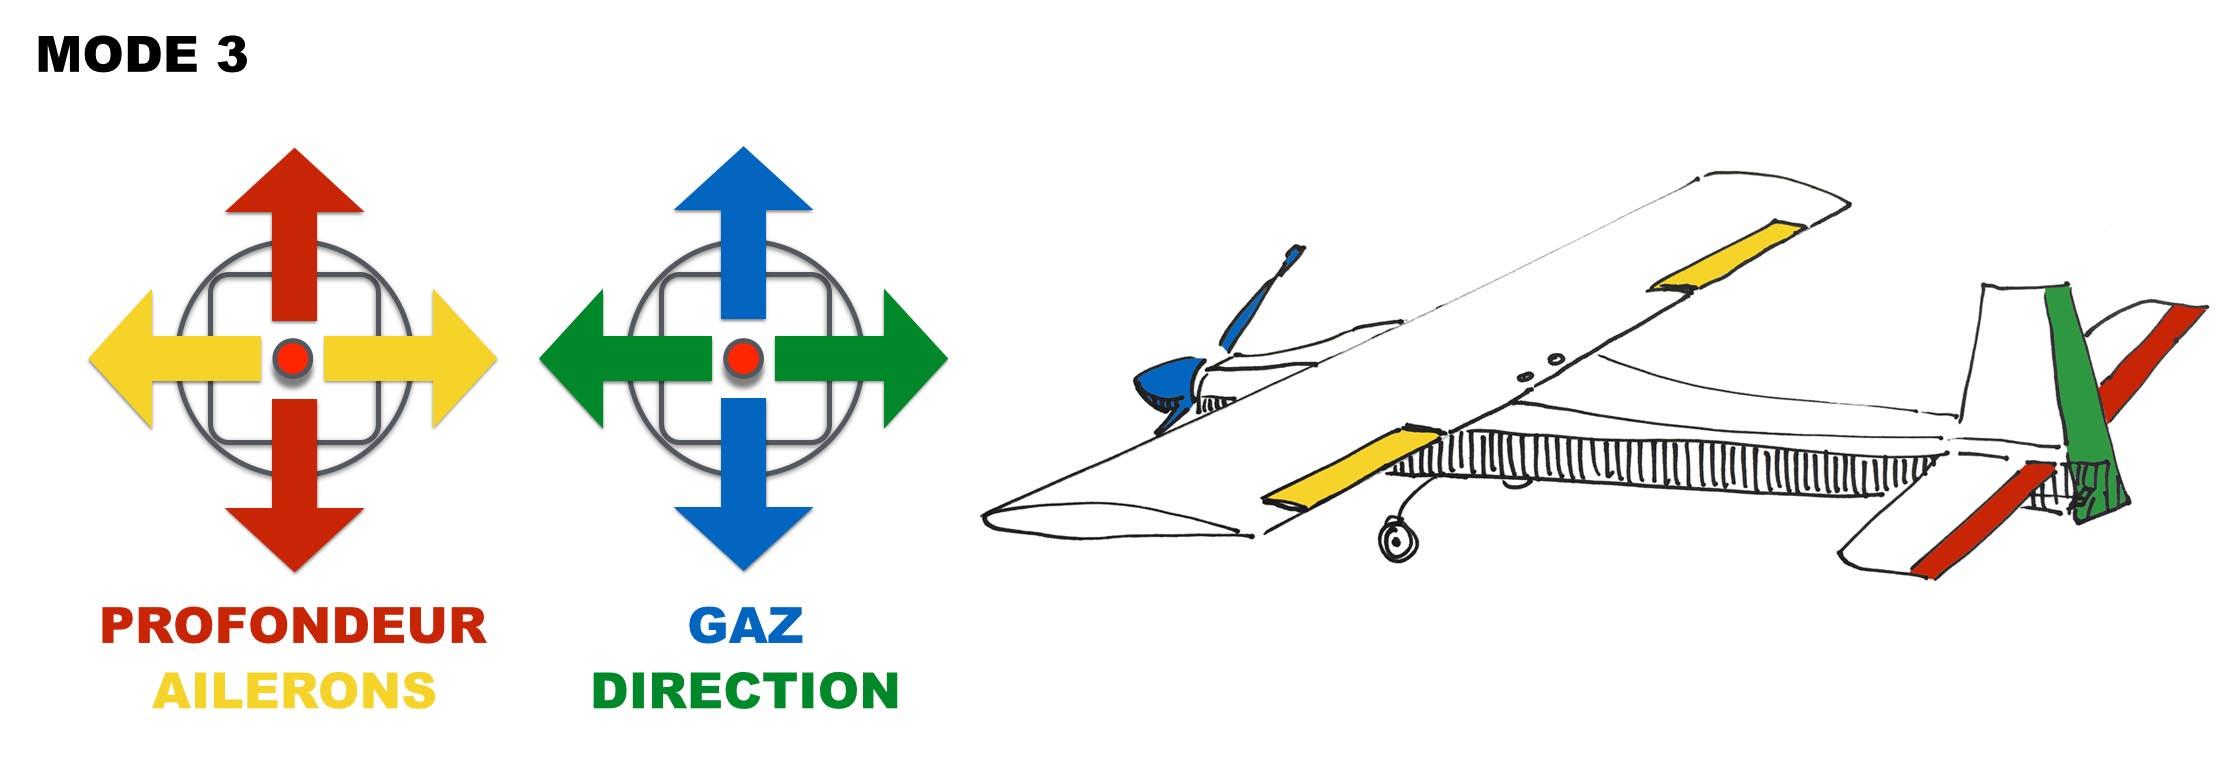 Mode 3 radiocommande avion rc